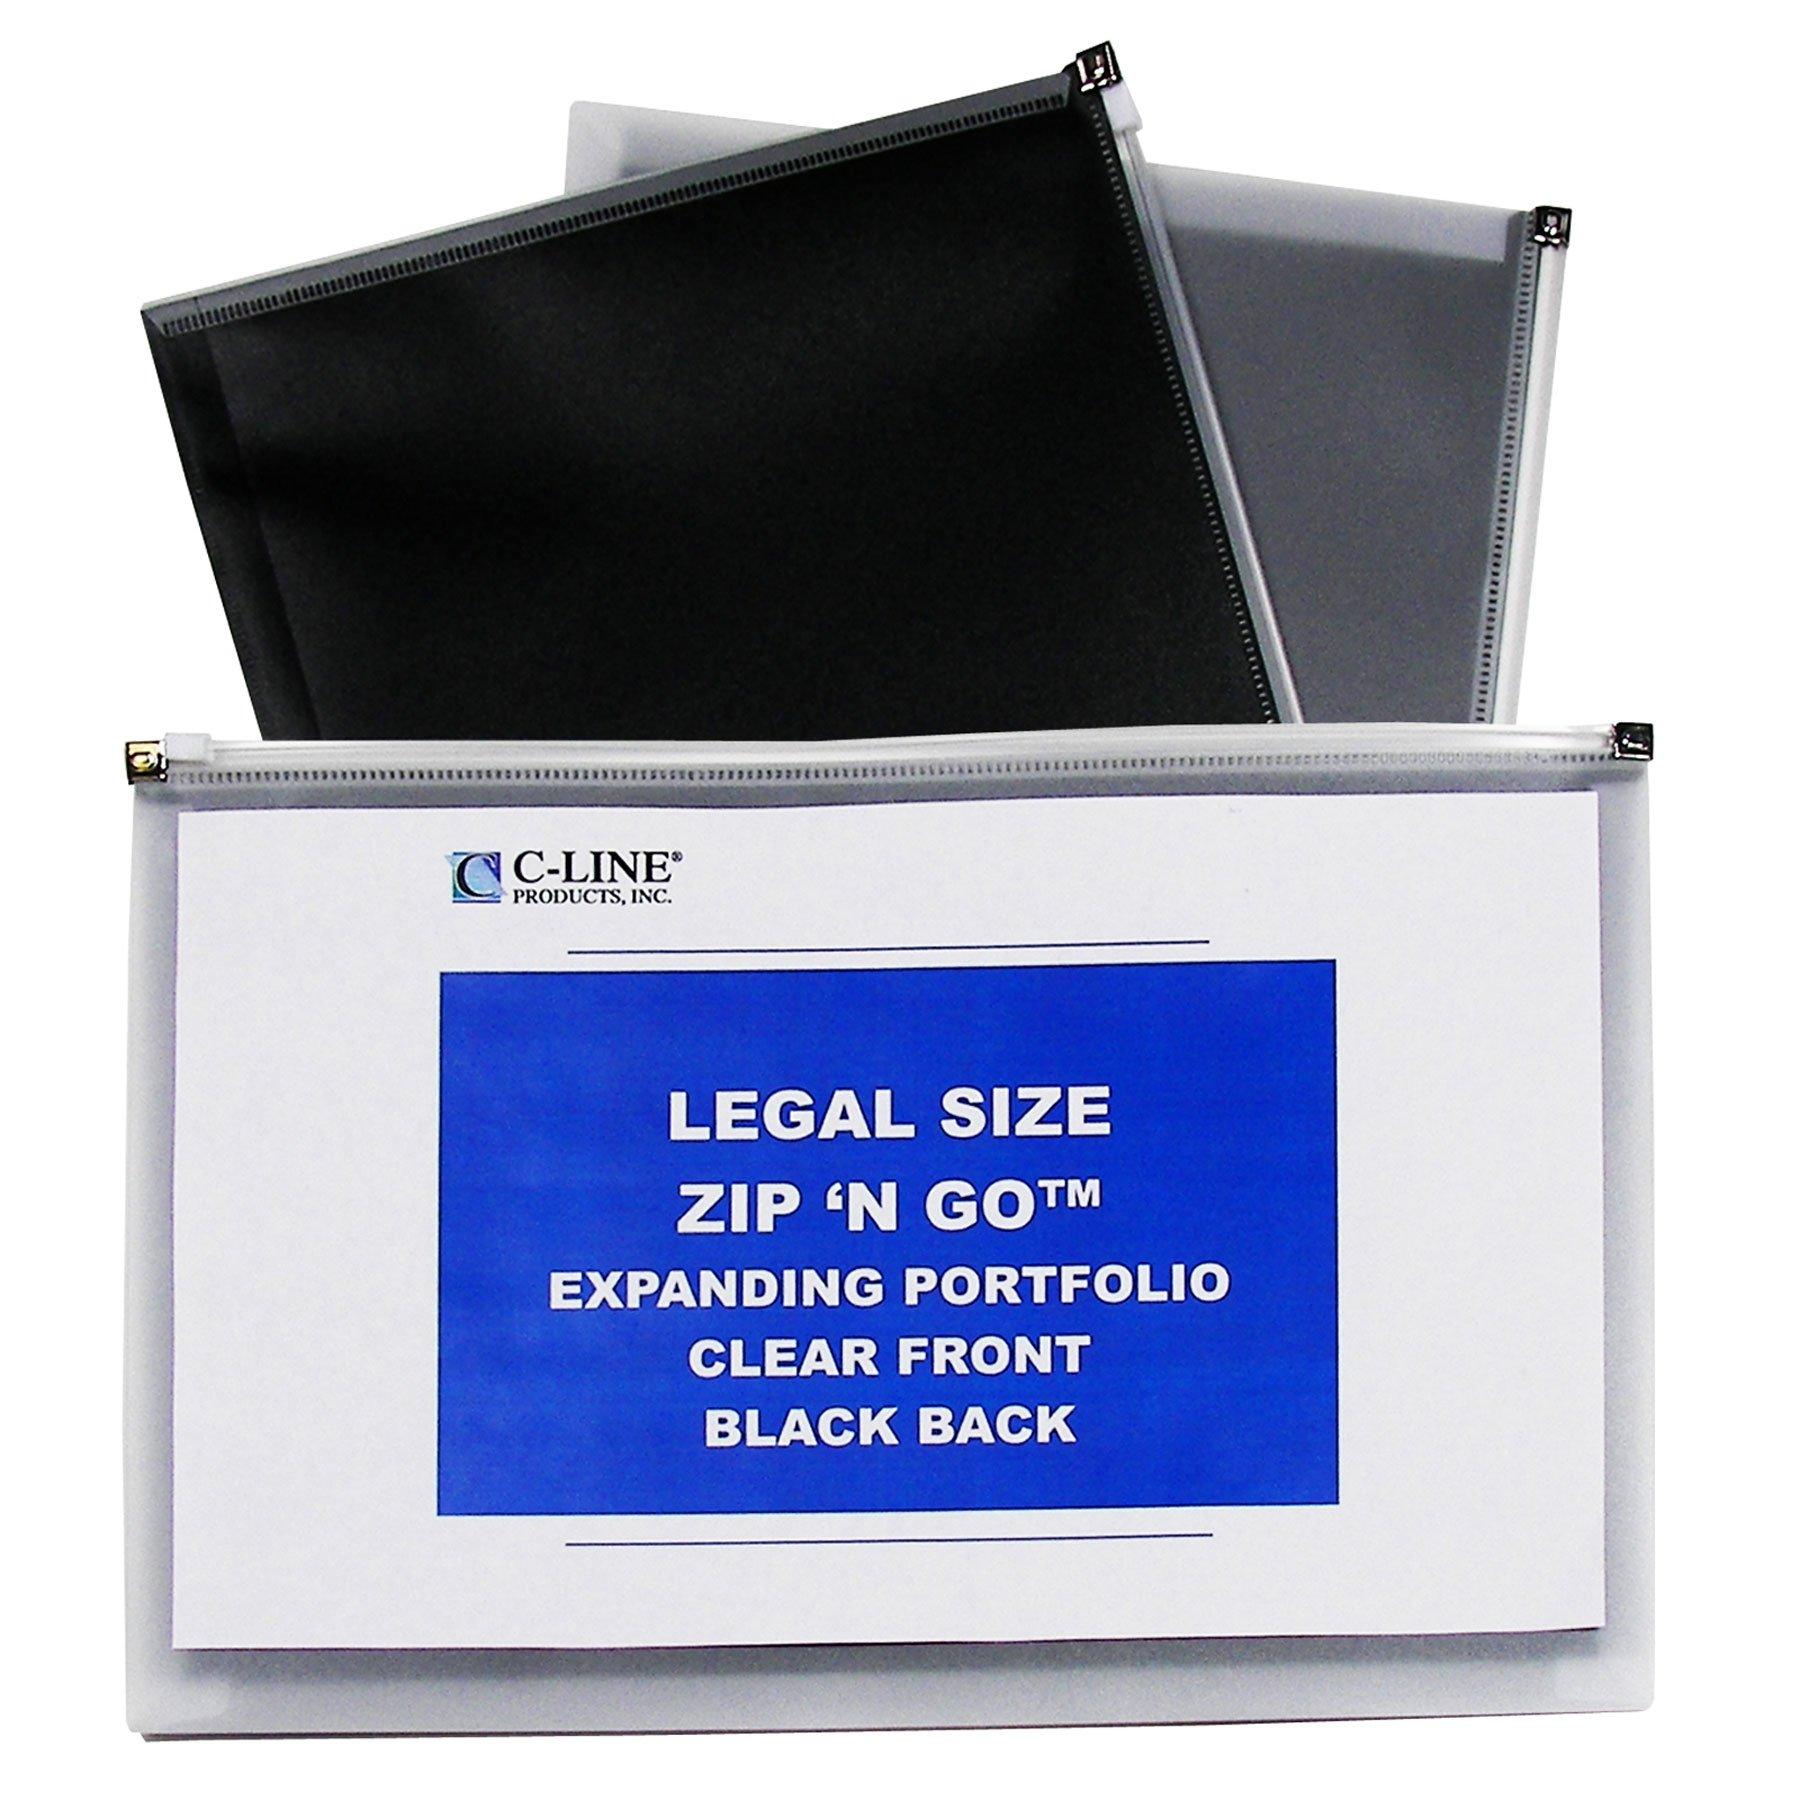 C-Line Zip 'N Go Expanding Portfolios, Legal Size, 200-Sheet Capacity, Black/Clear, 5 per Pack (48101)